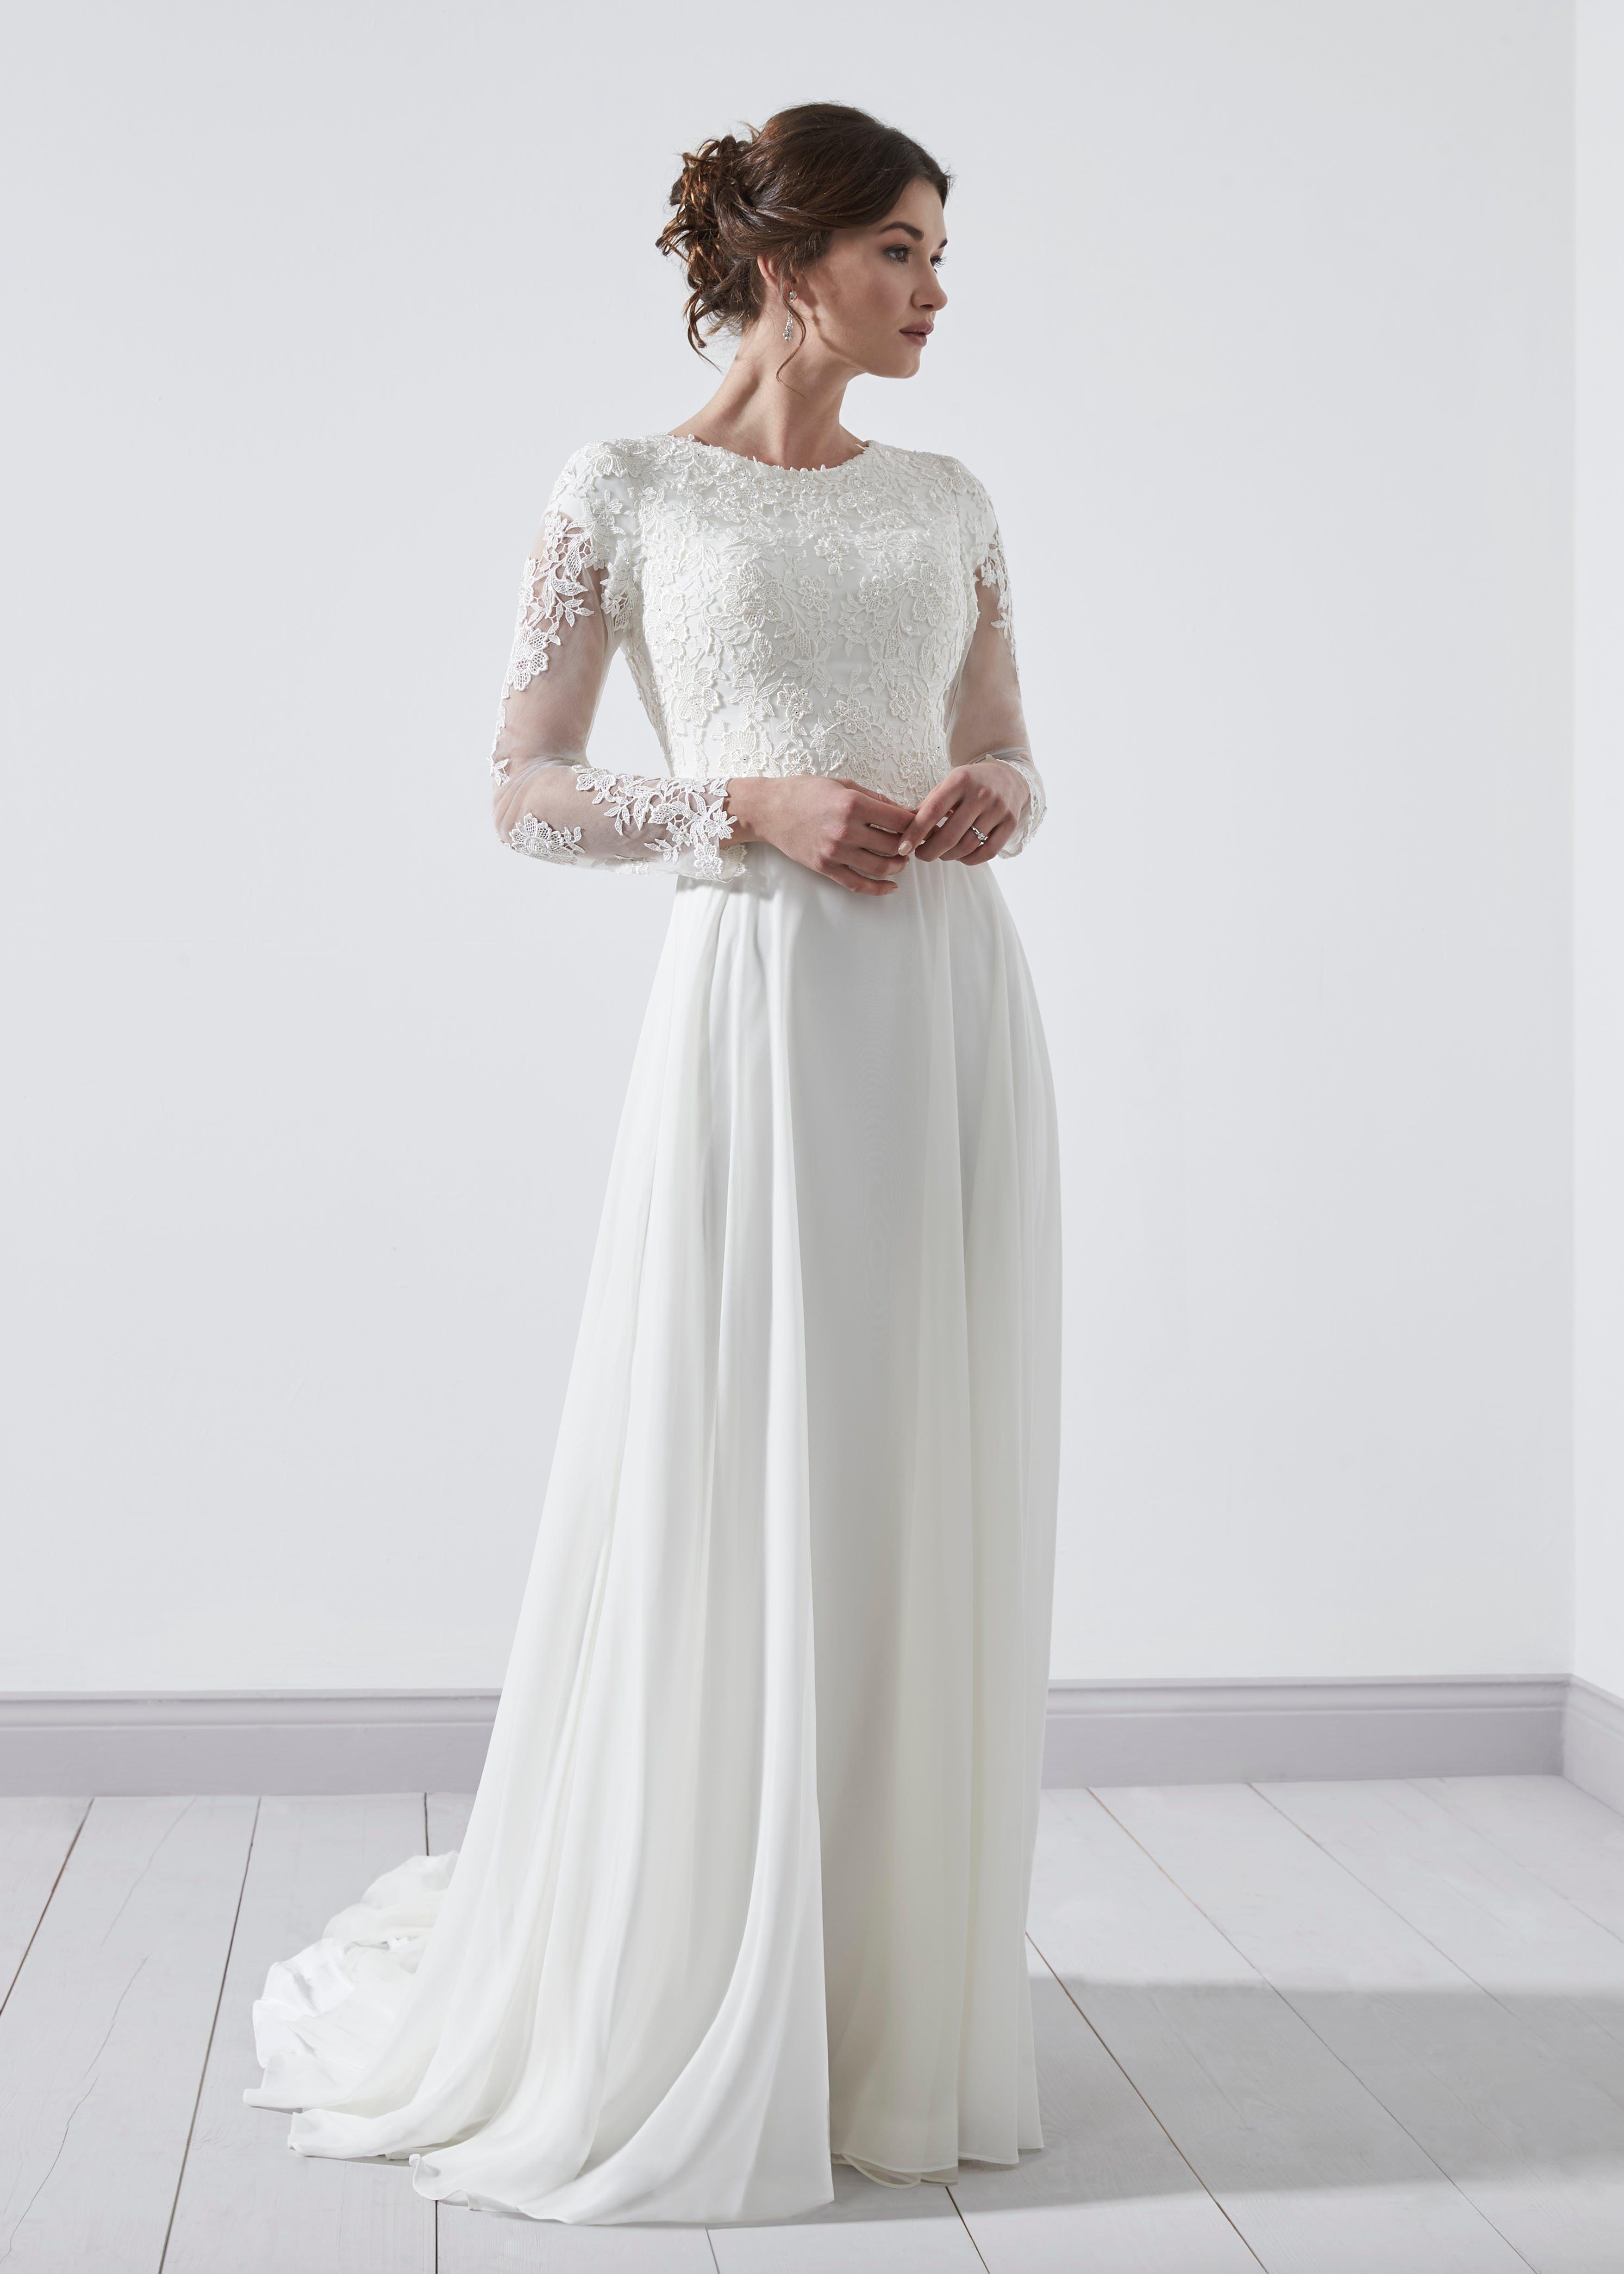 Pc8383 Romantica Wedding Dress Long Sleeve Stunning Wedding Dresses Wedding Dresses [ 4911 x 3508 Pixel ]